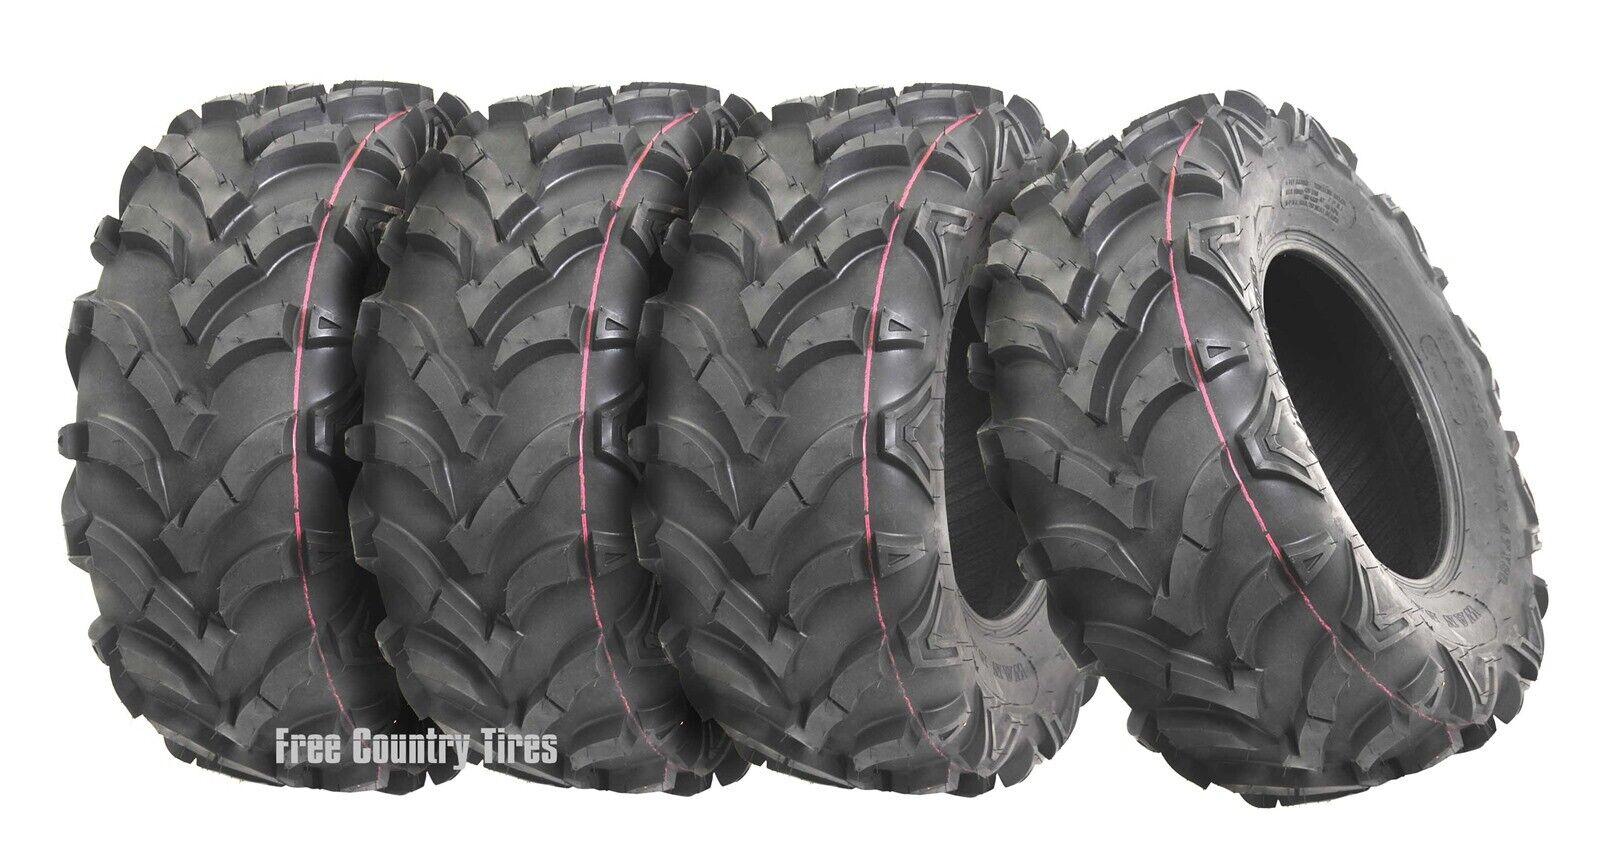 6 Ply Tubeless VANACC Set of 2 24x11-10 ATV UTV Tire All-Terrain Off-Road